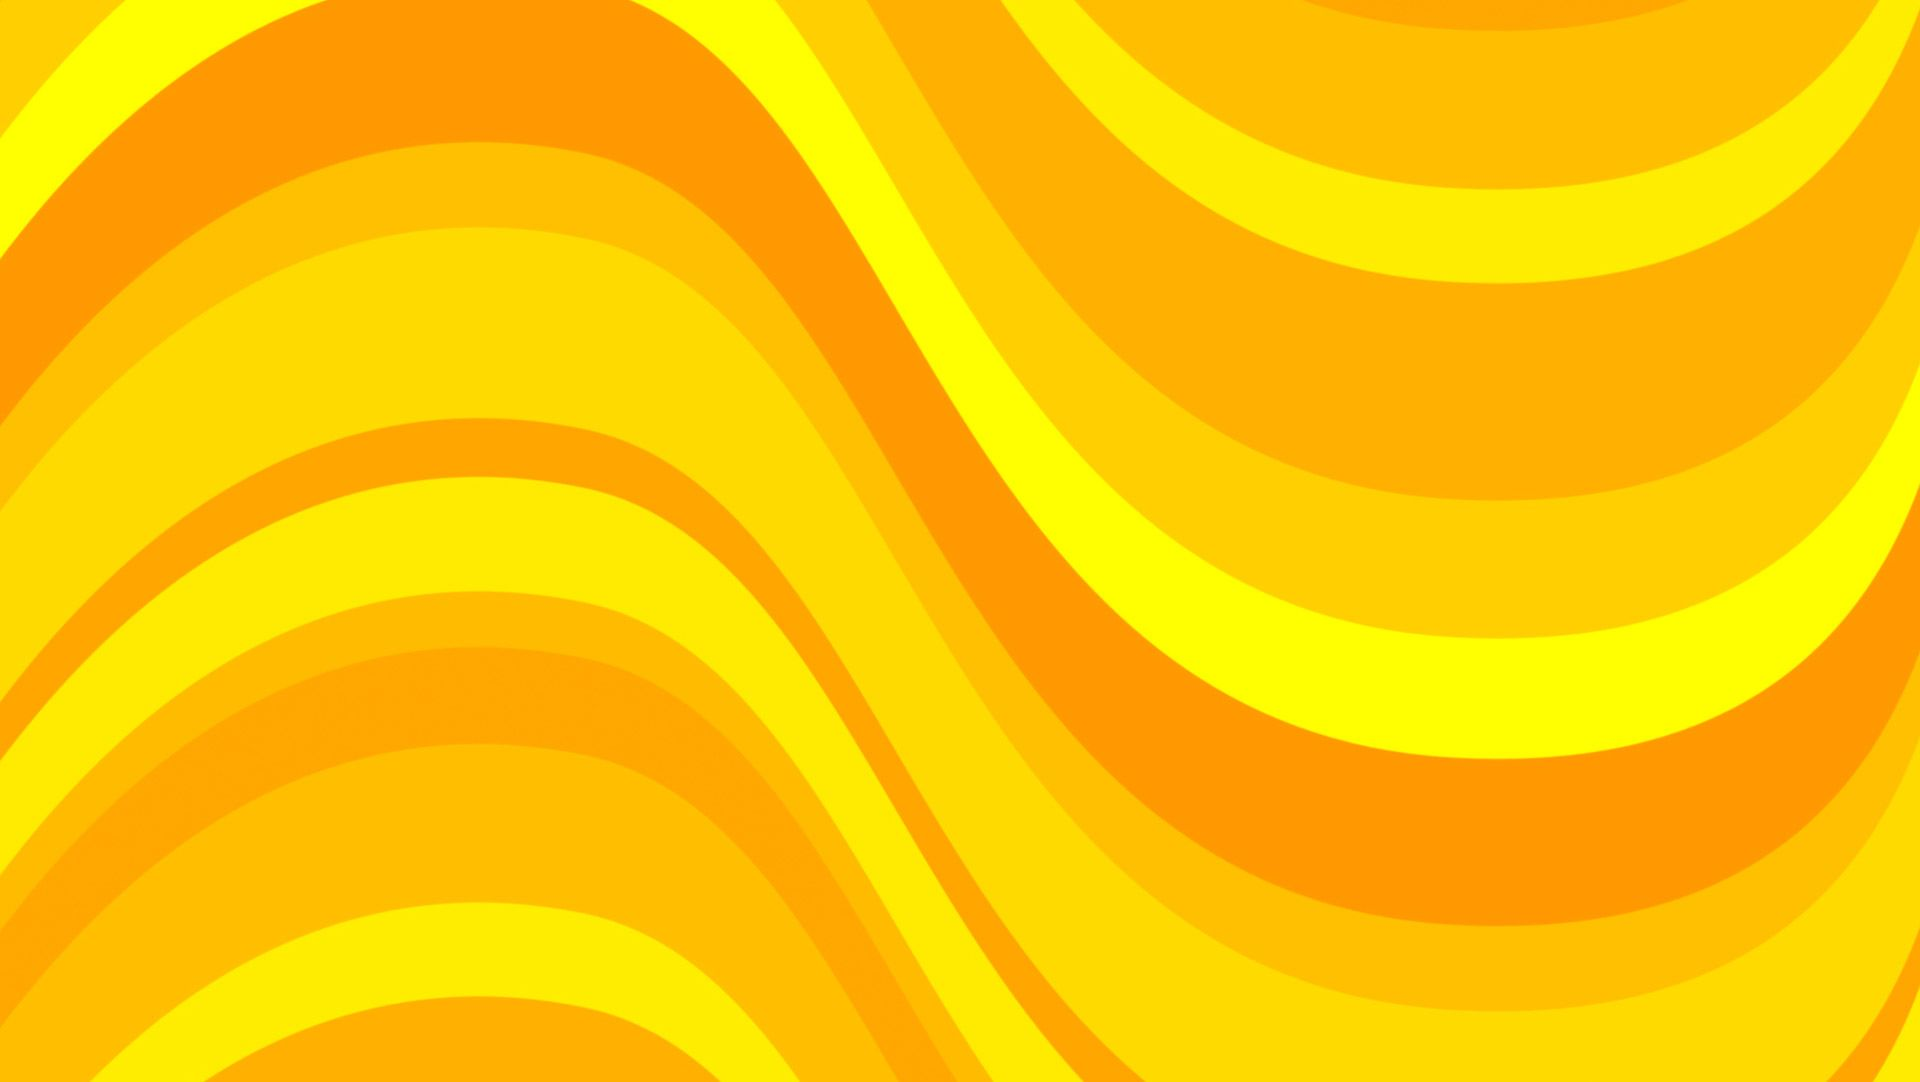 Yellow Background Orange Yellow Background Free Stock